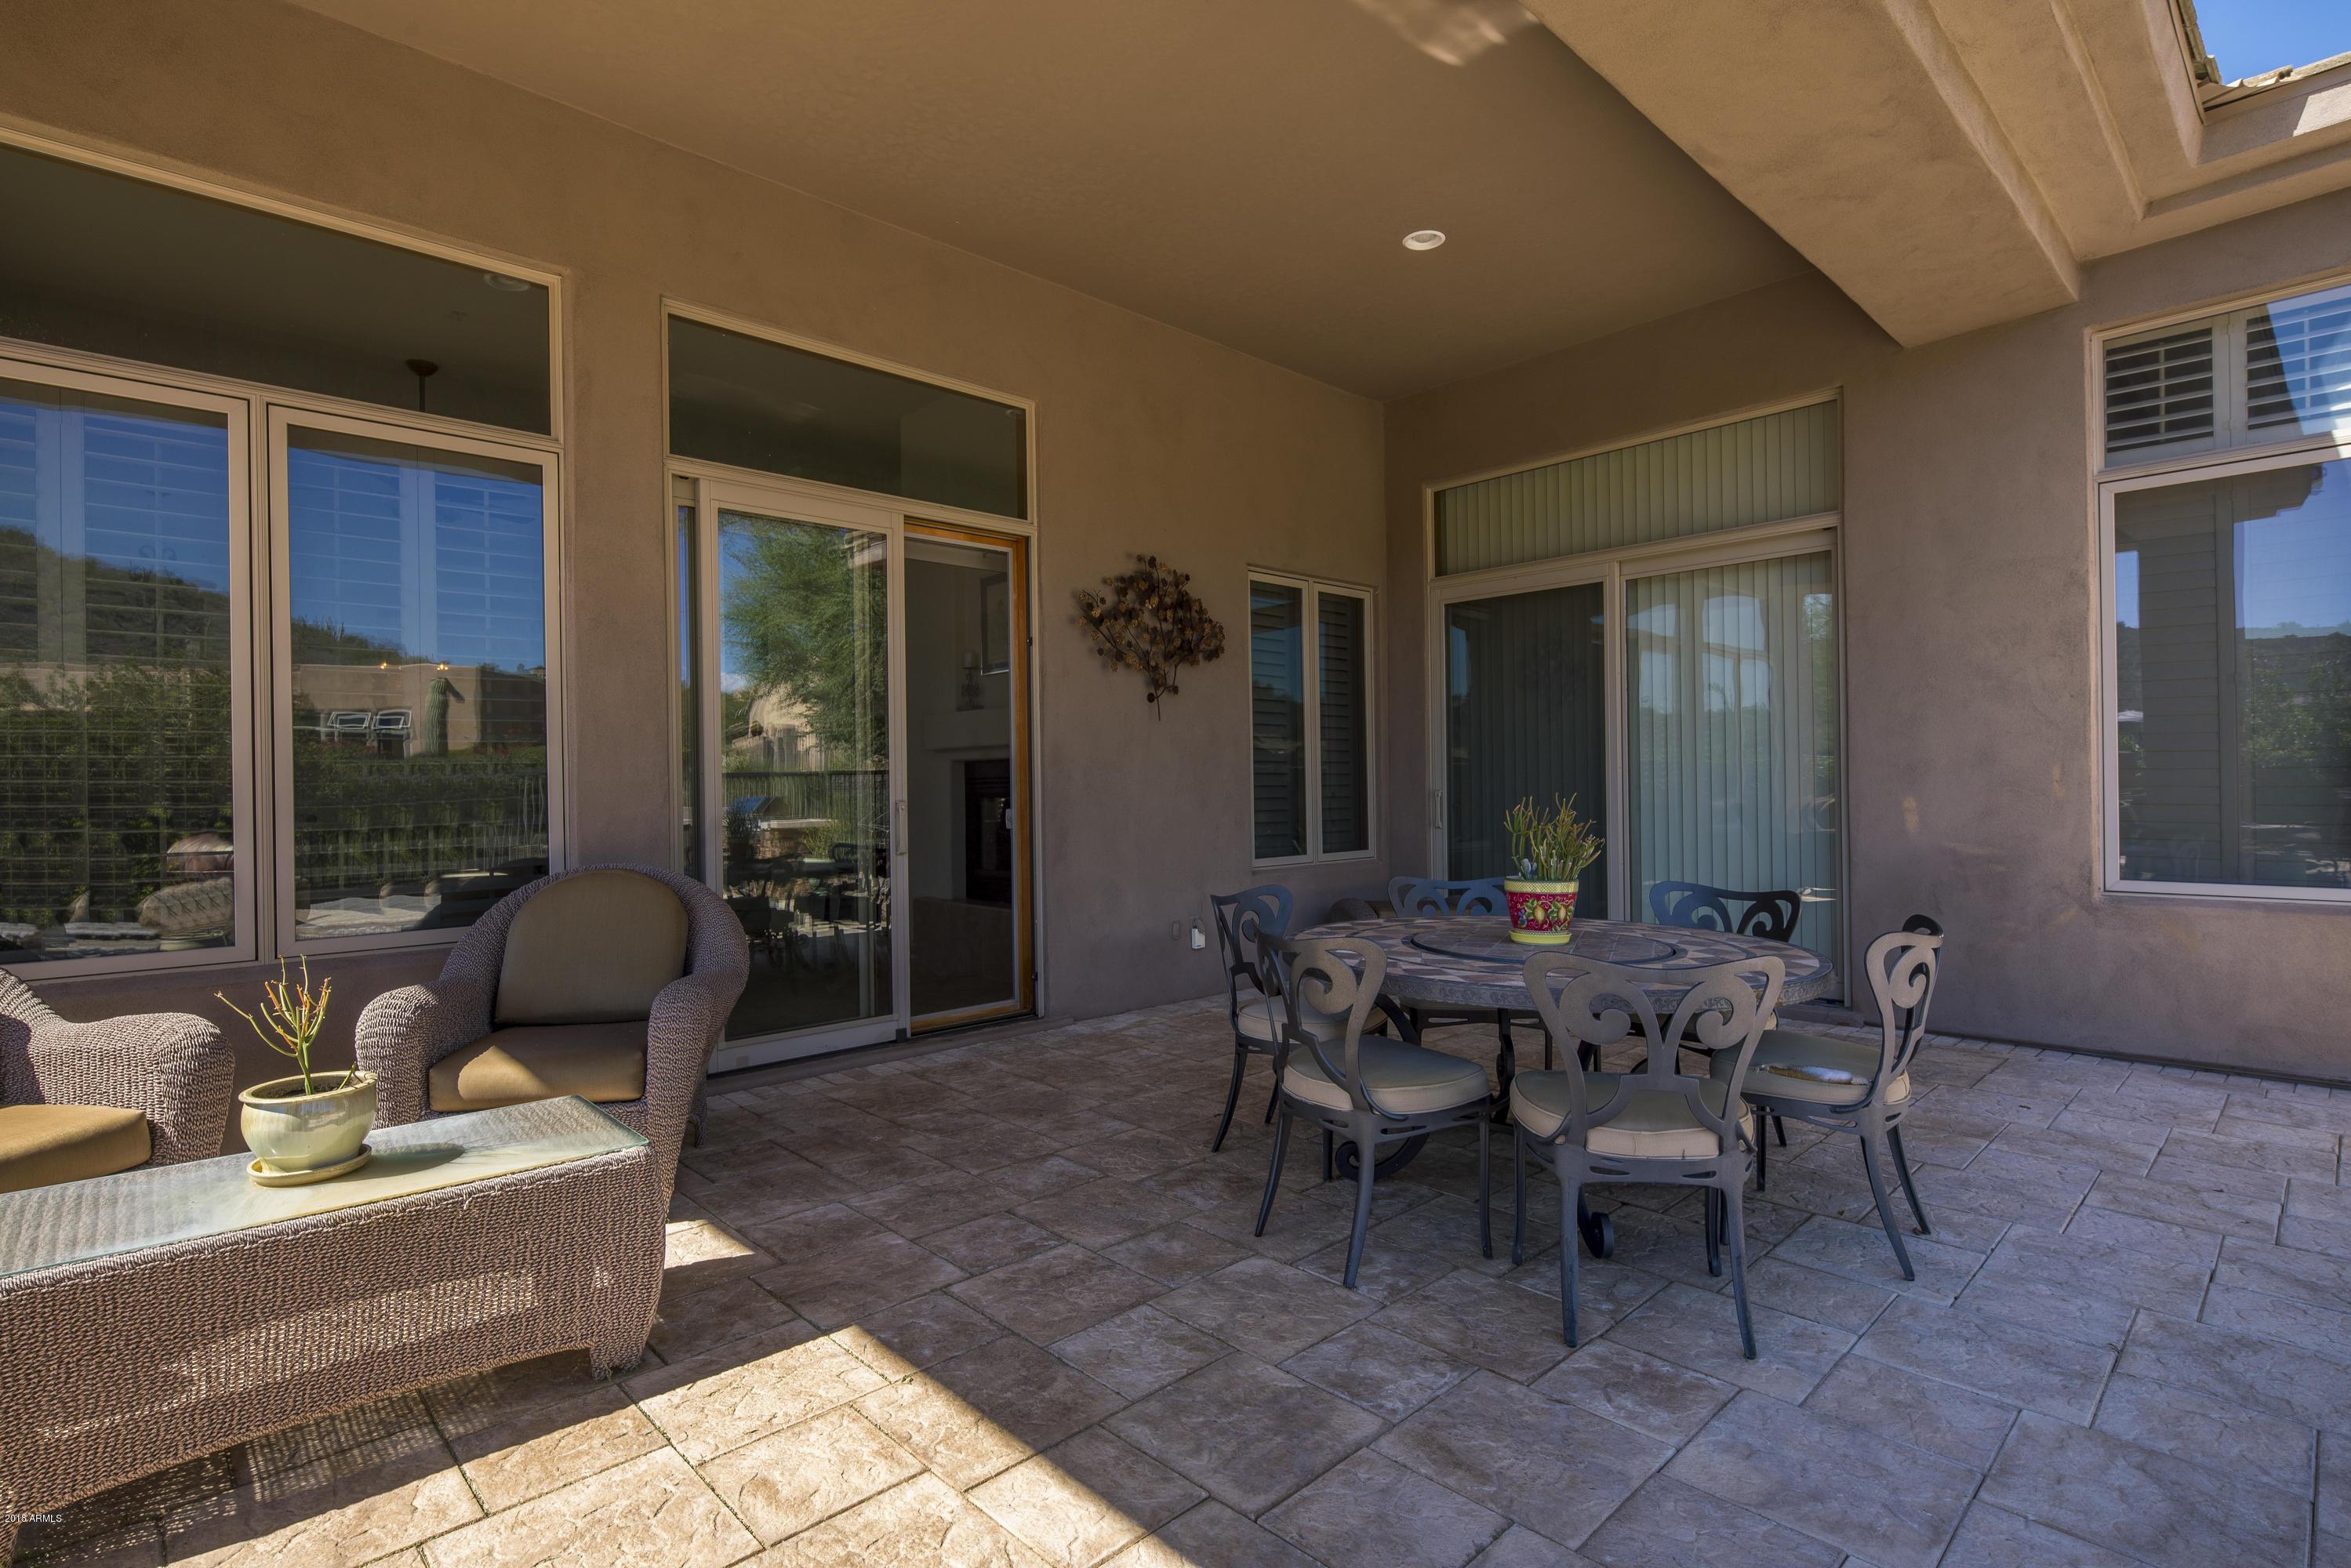 MLS 5832125 14397 E GERONIMO Road, Scottsdale, AZ 85259 Scottsdale AZ Hidden Hills